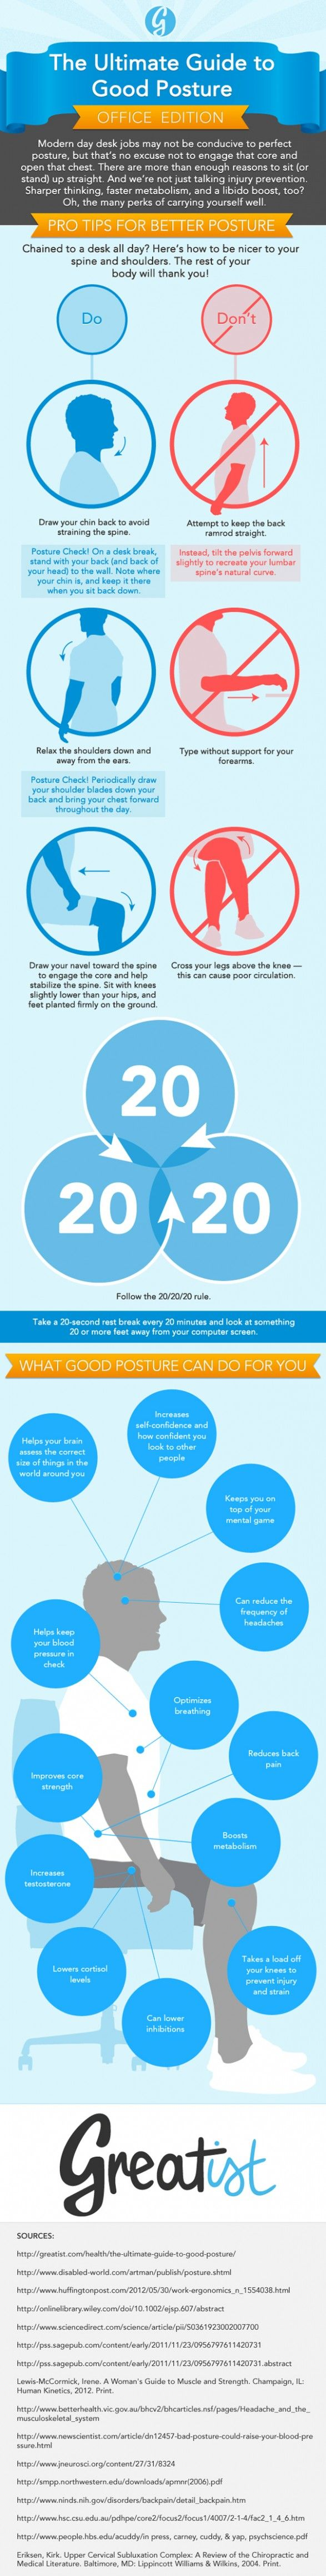 8 best Work Injuries & Prevention images on Pinterest | Health ...